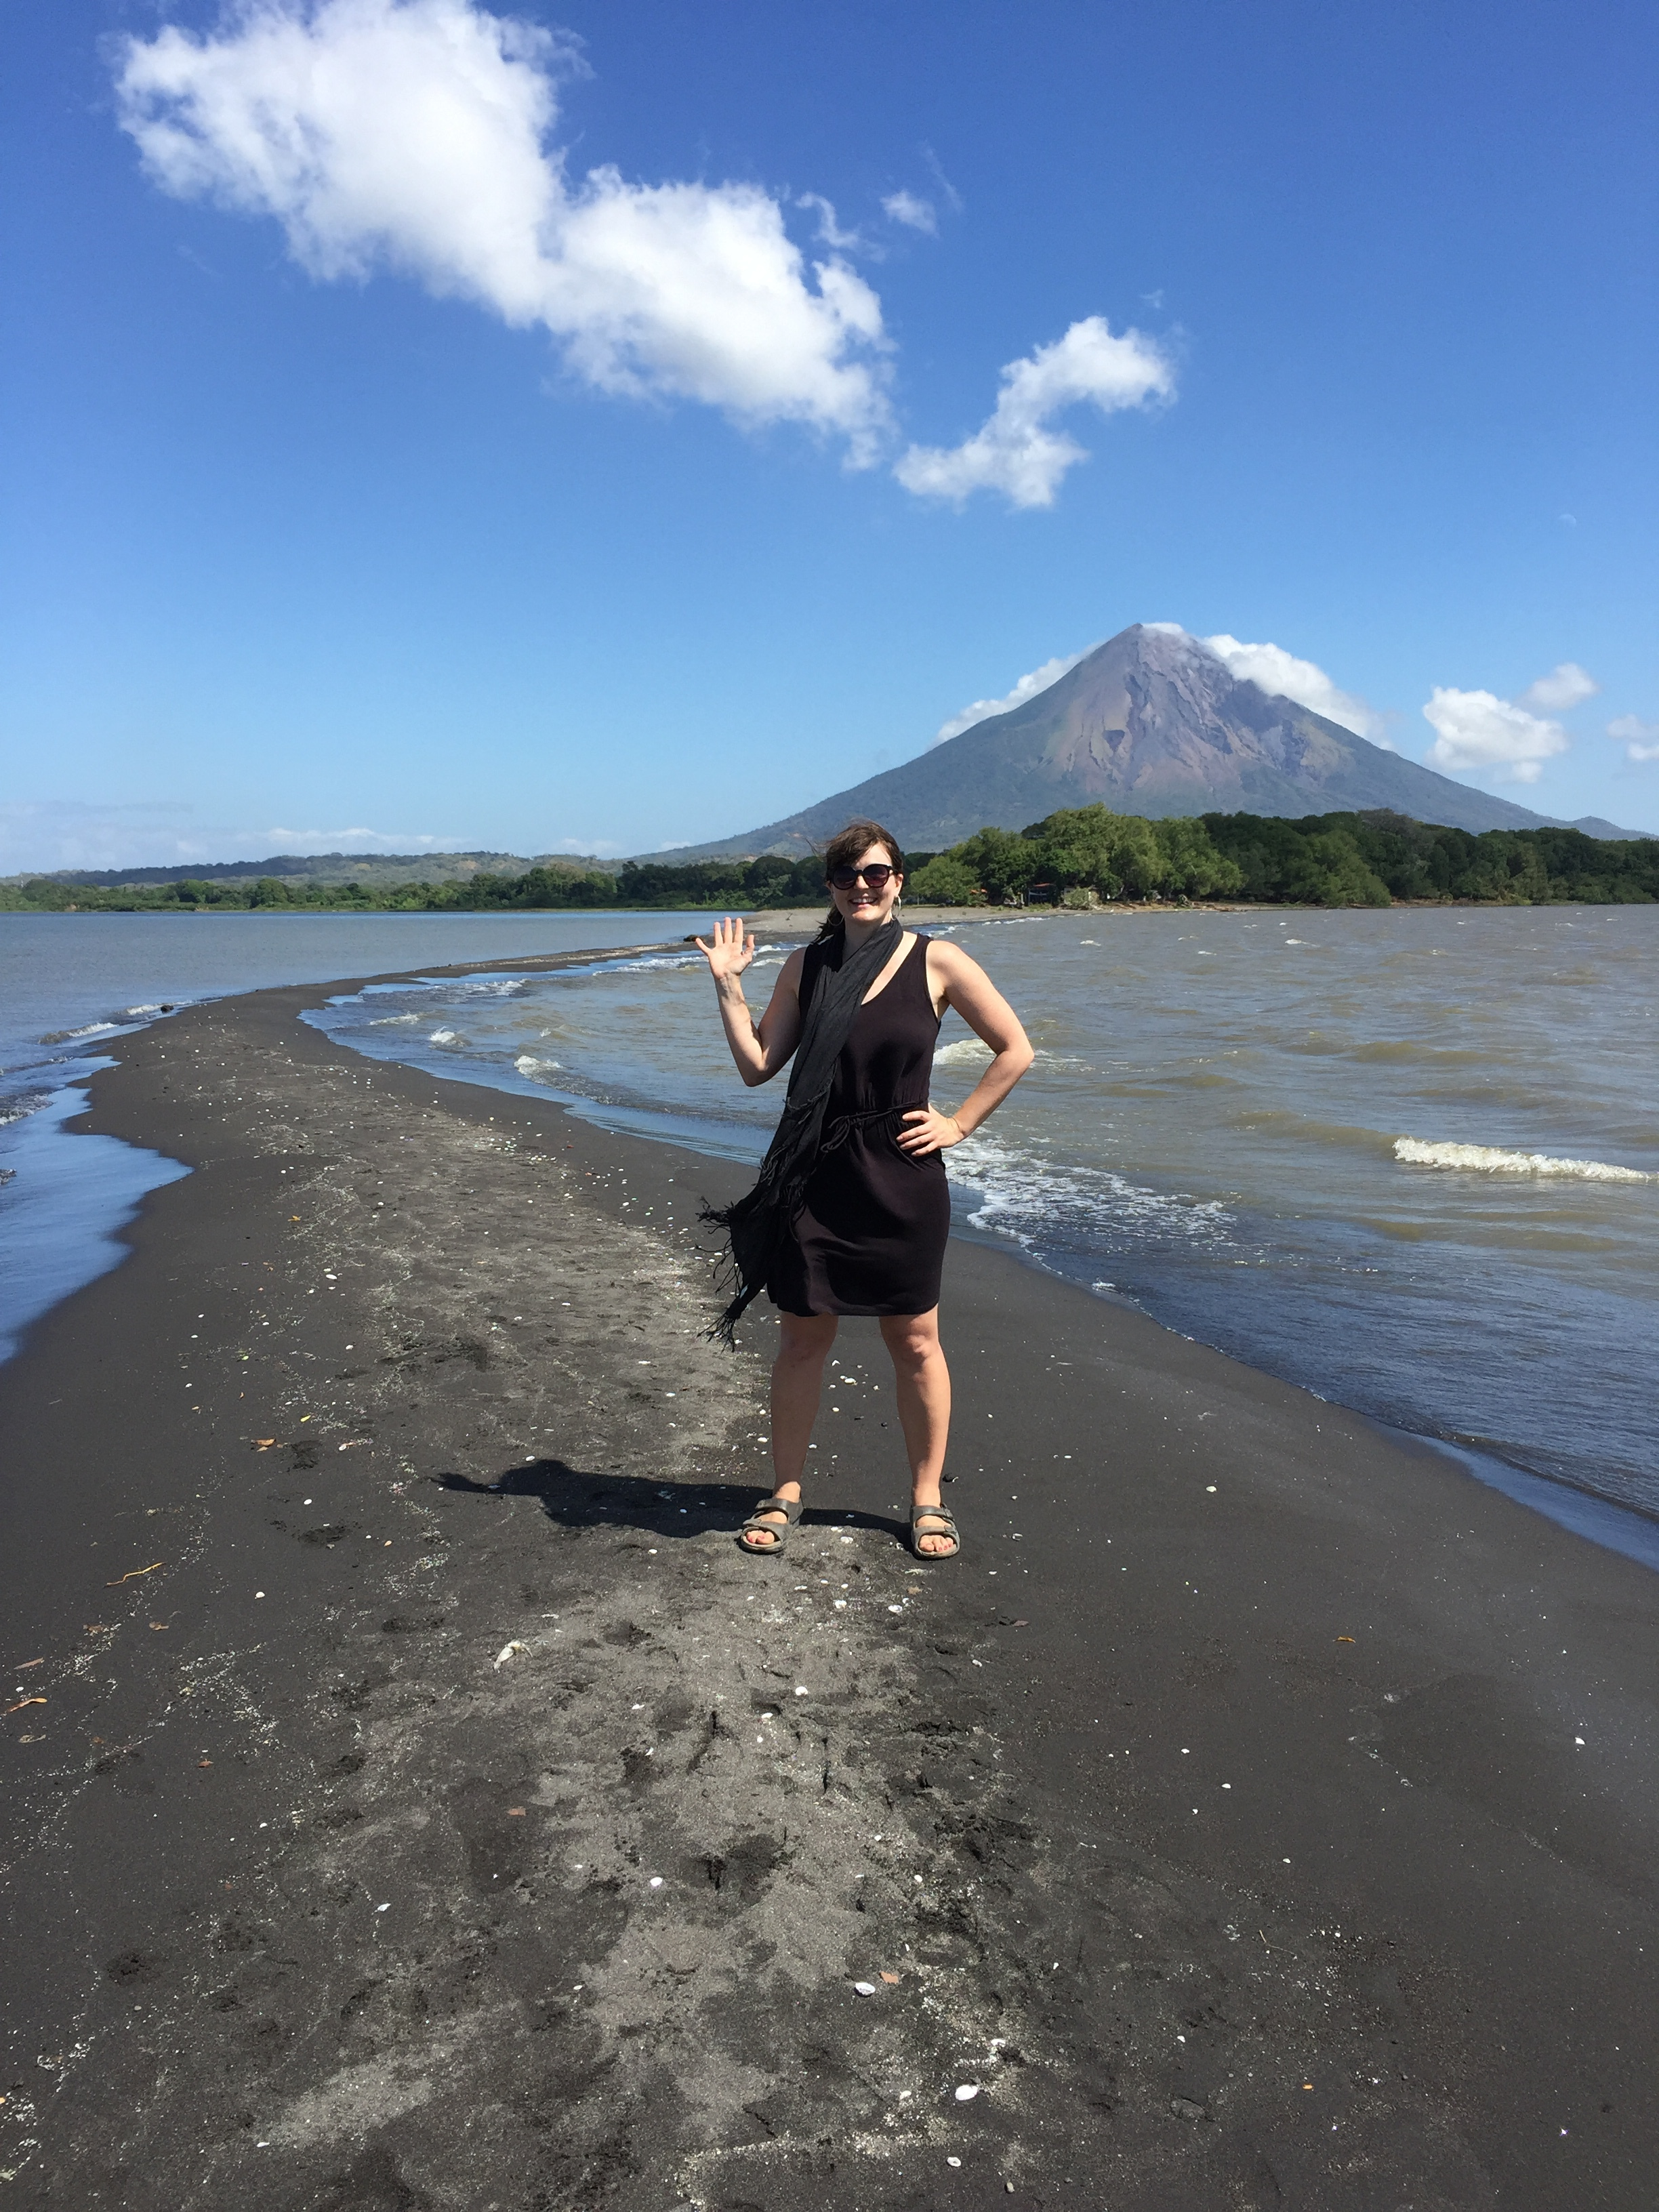 Nicaragua: No Resort Fees